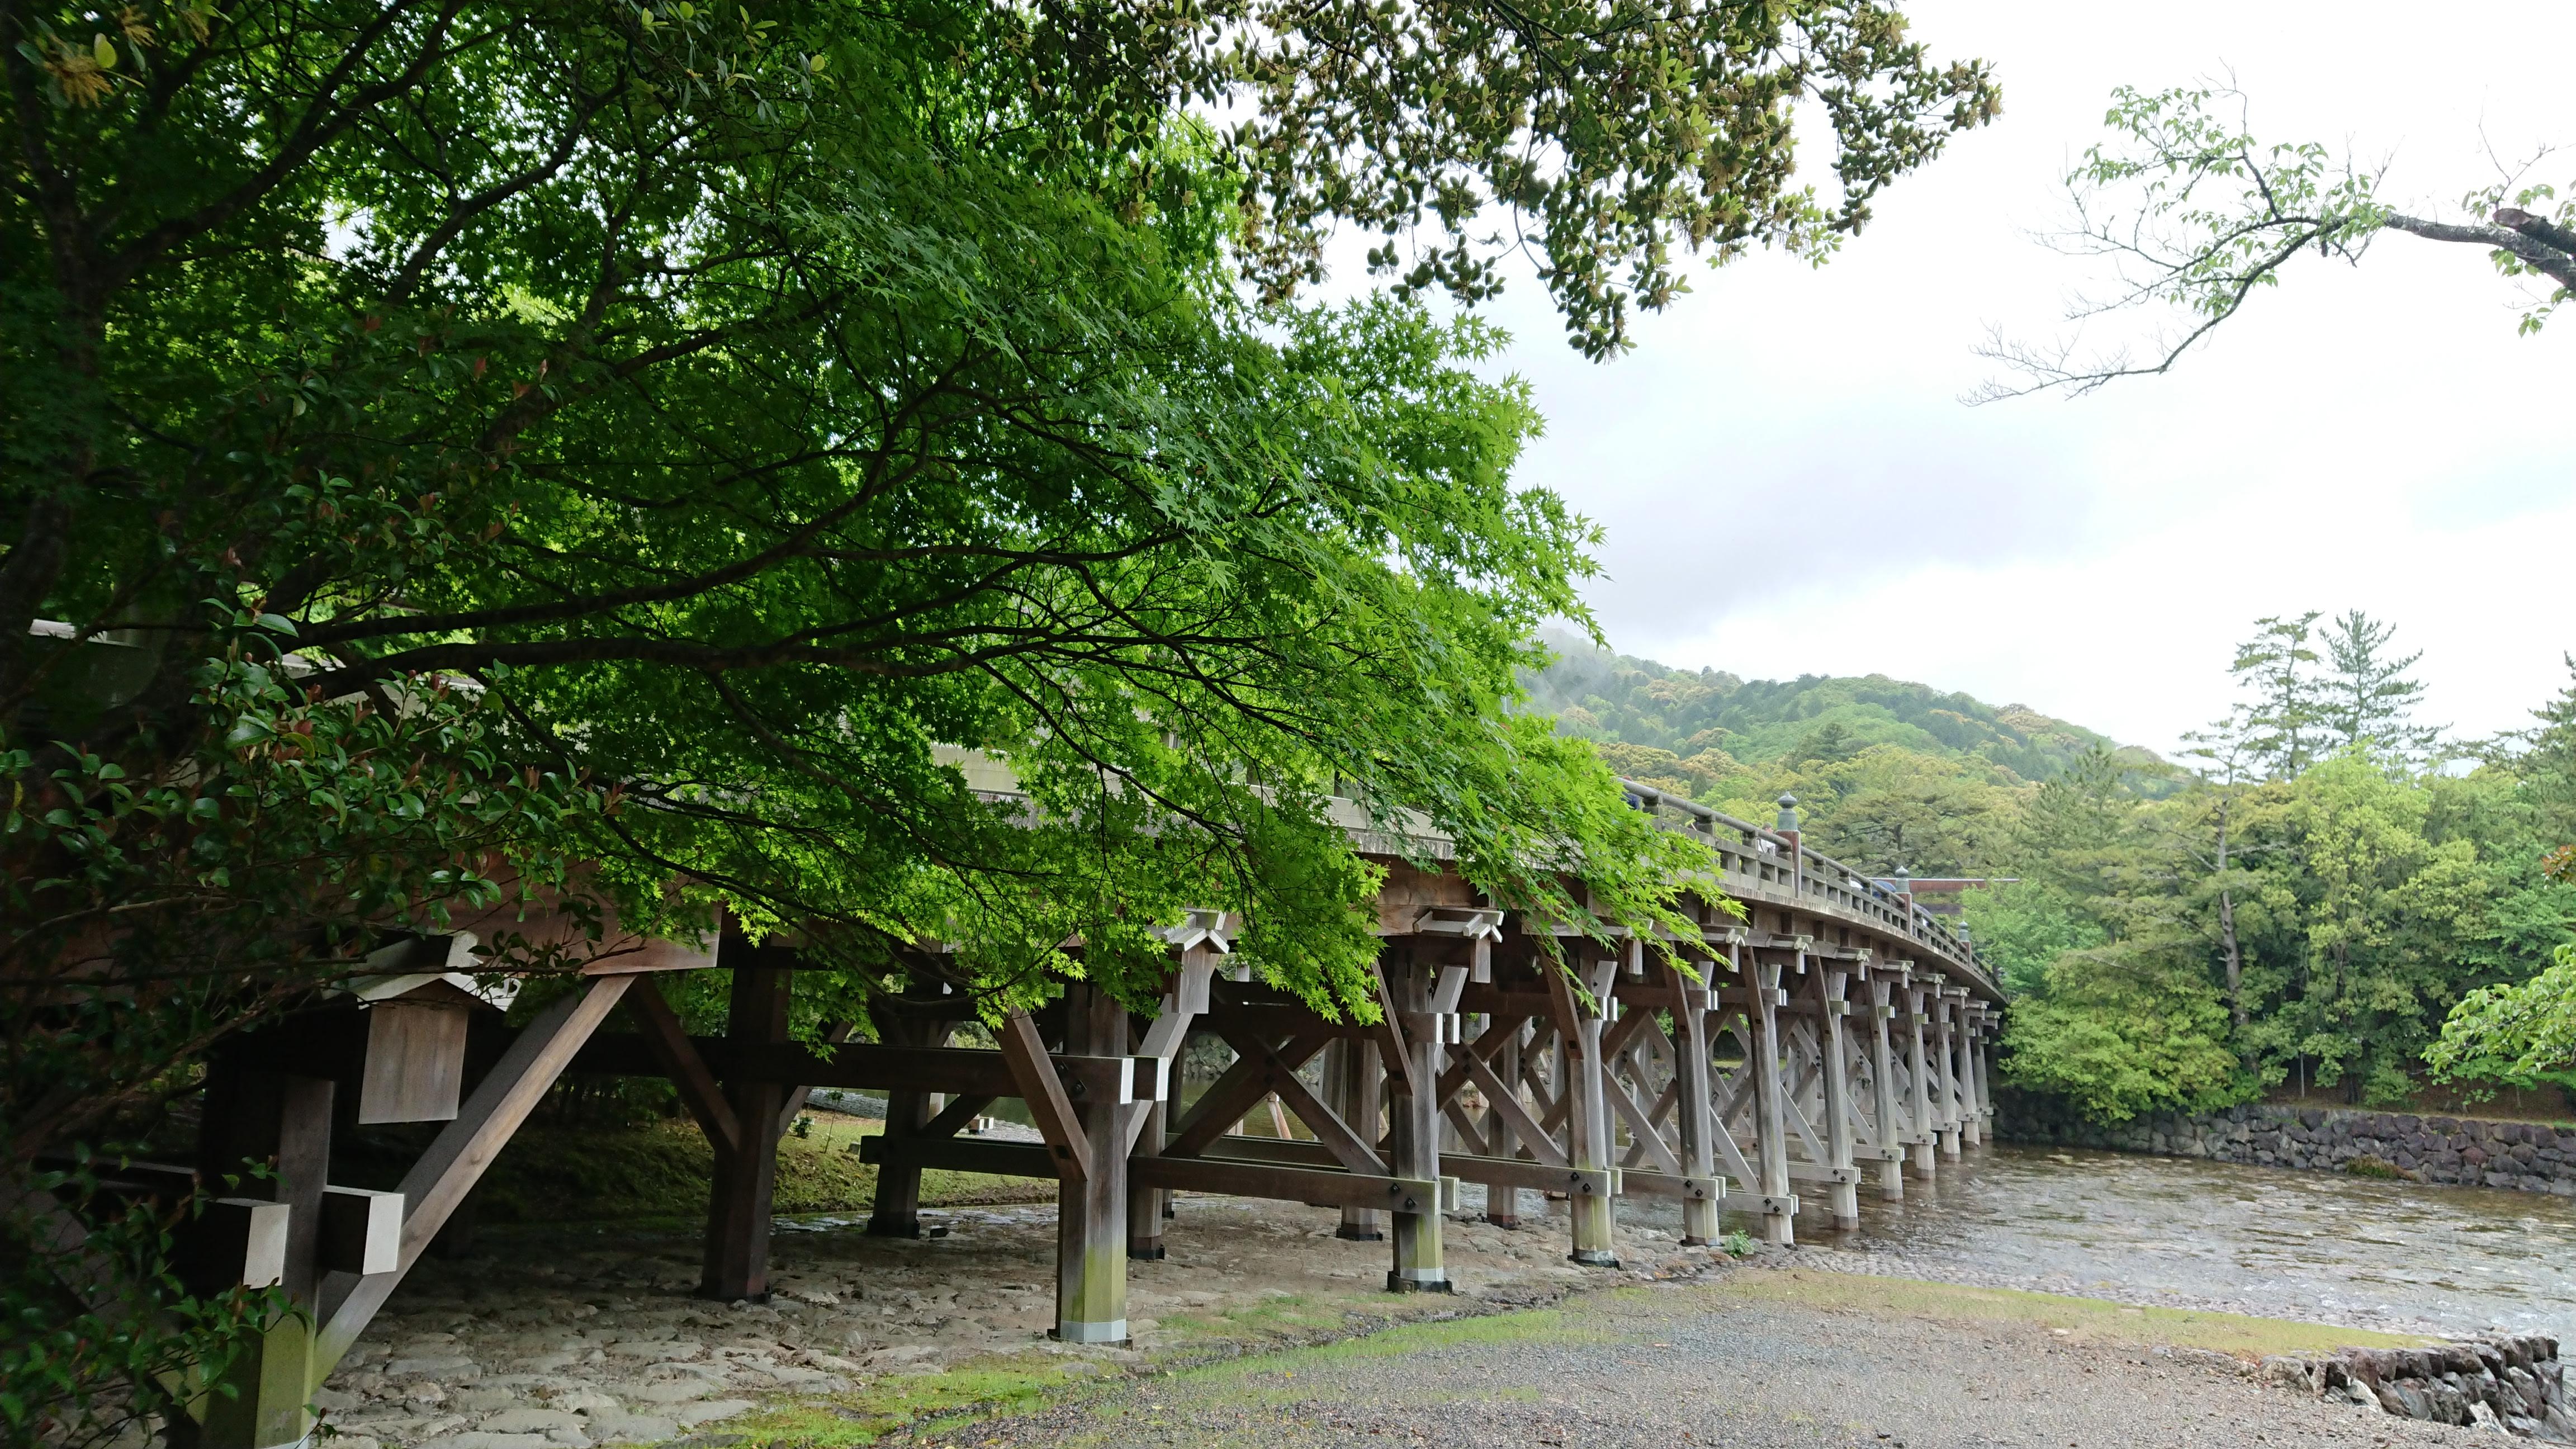 A view of Ise bridge